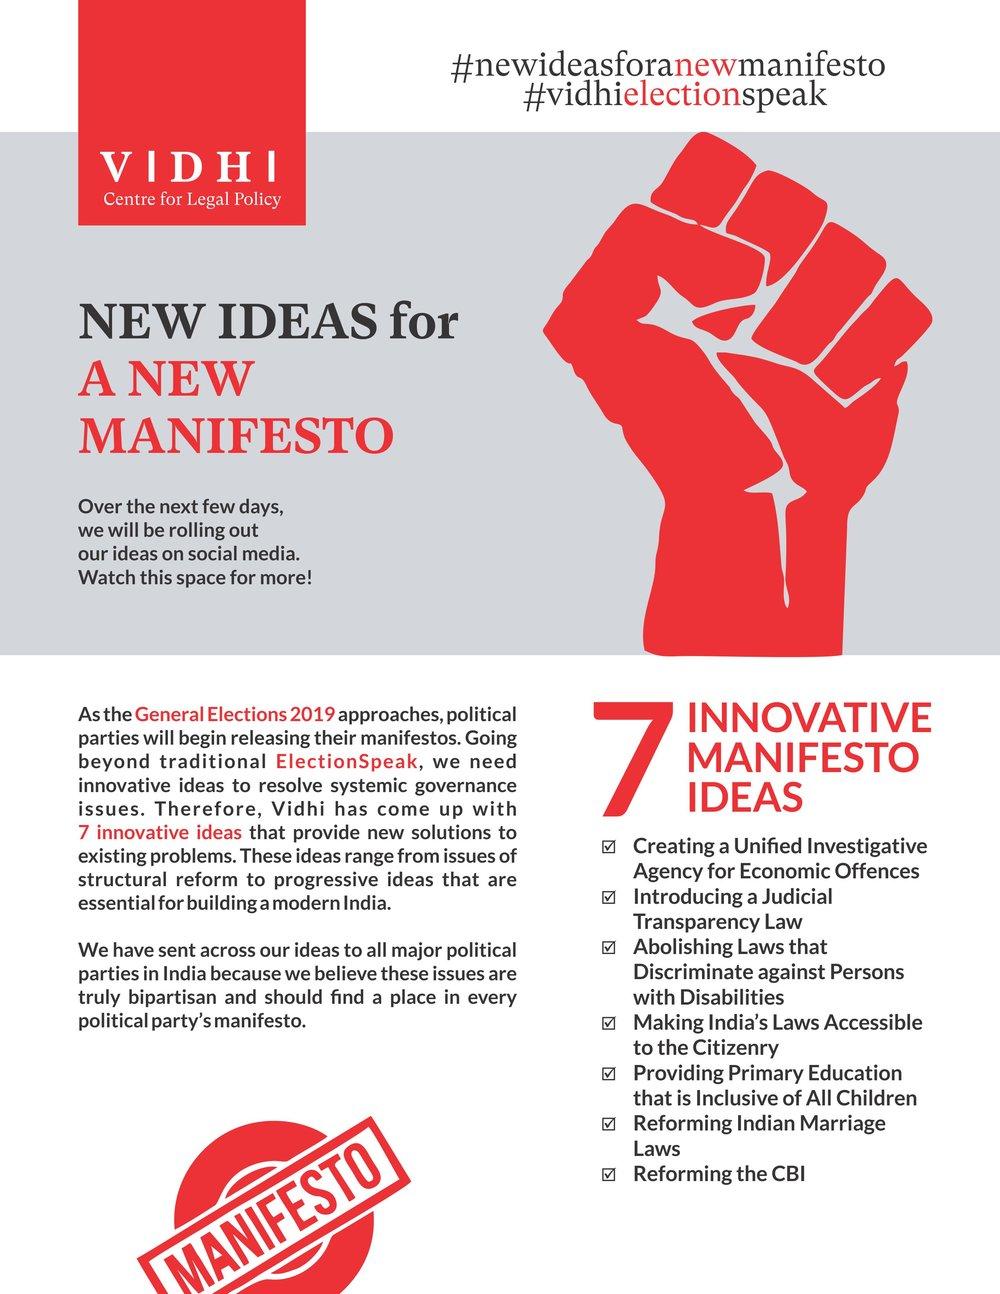 Vidhi launches #newideasforanewmanifesto campaign 1